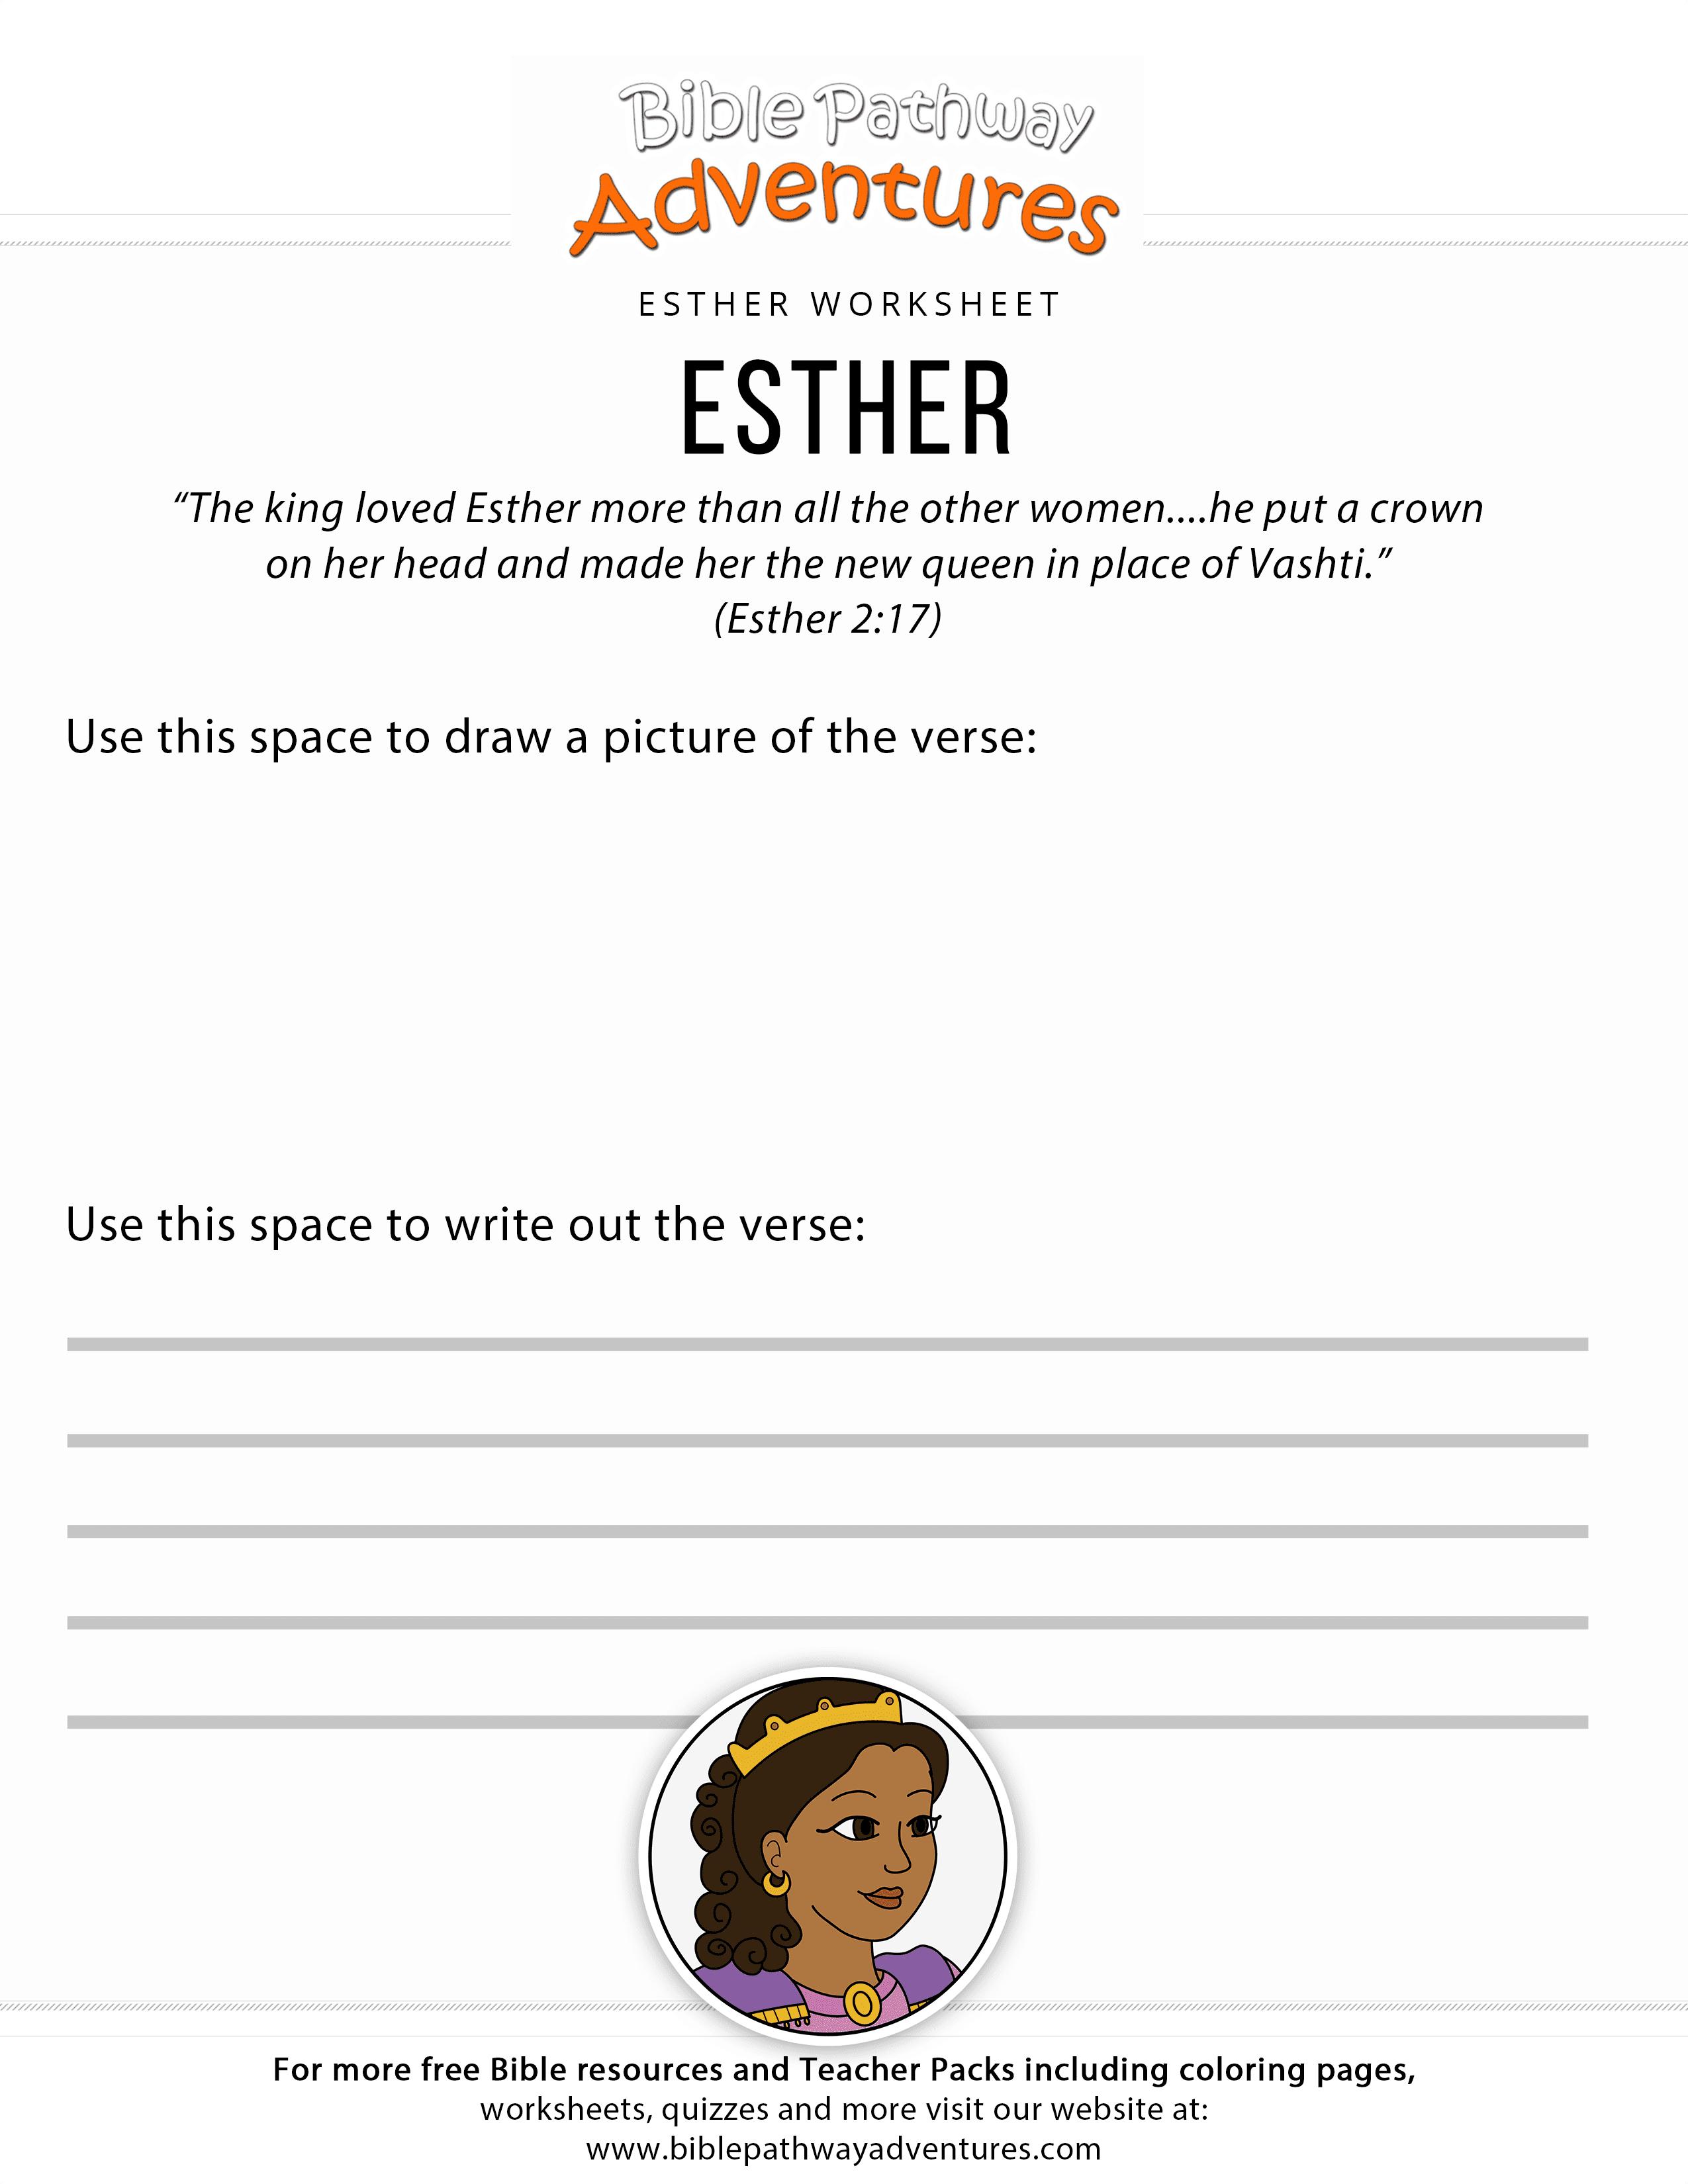 Esther Worksheet Bible Pathway Adventures Bible Study For Kids Printable Bible Activities Esther Bible [ 3300 x 2550 Pixel ]